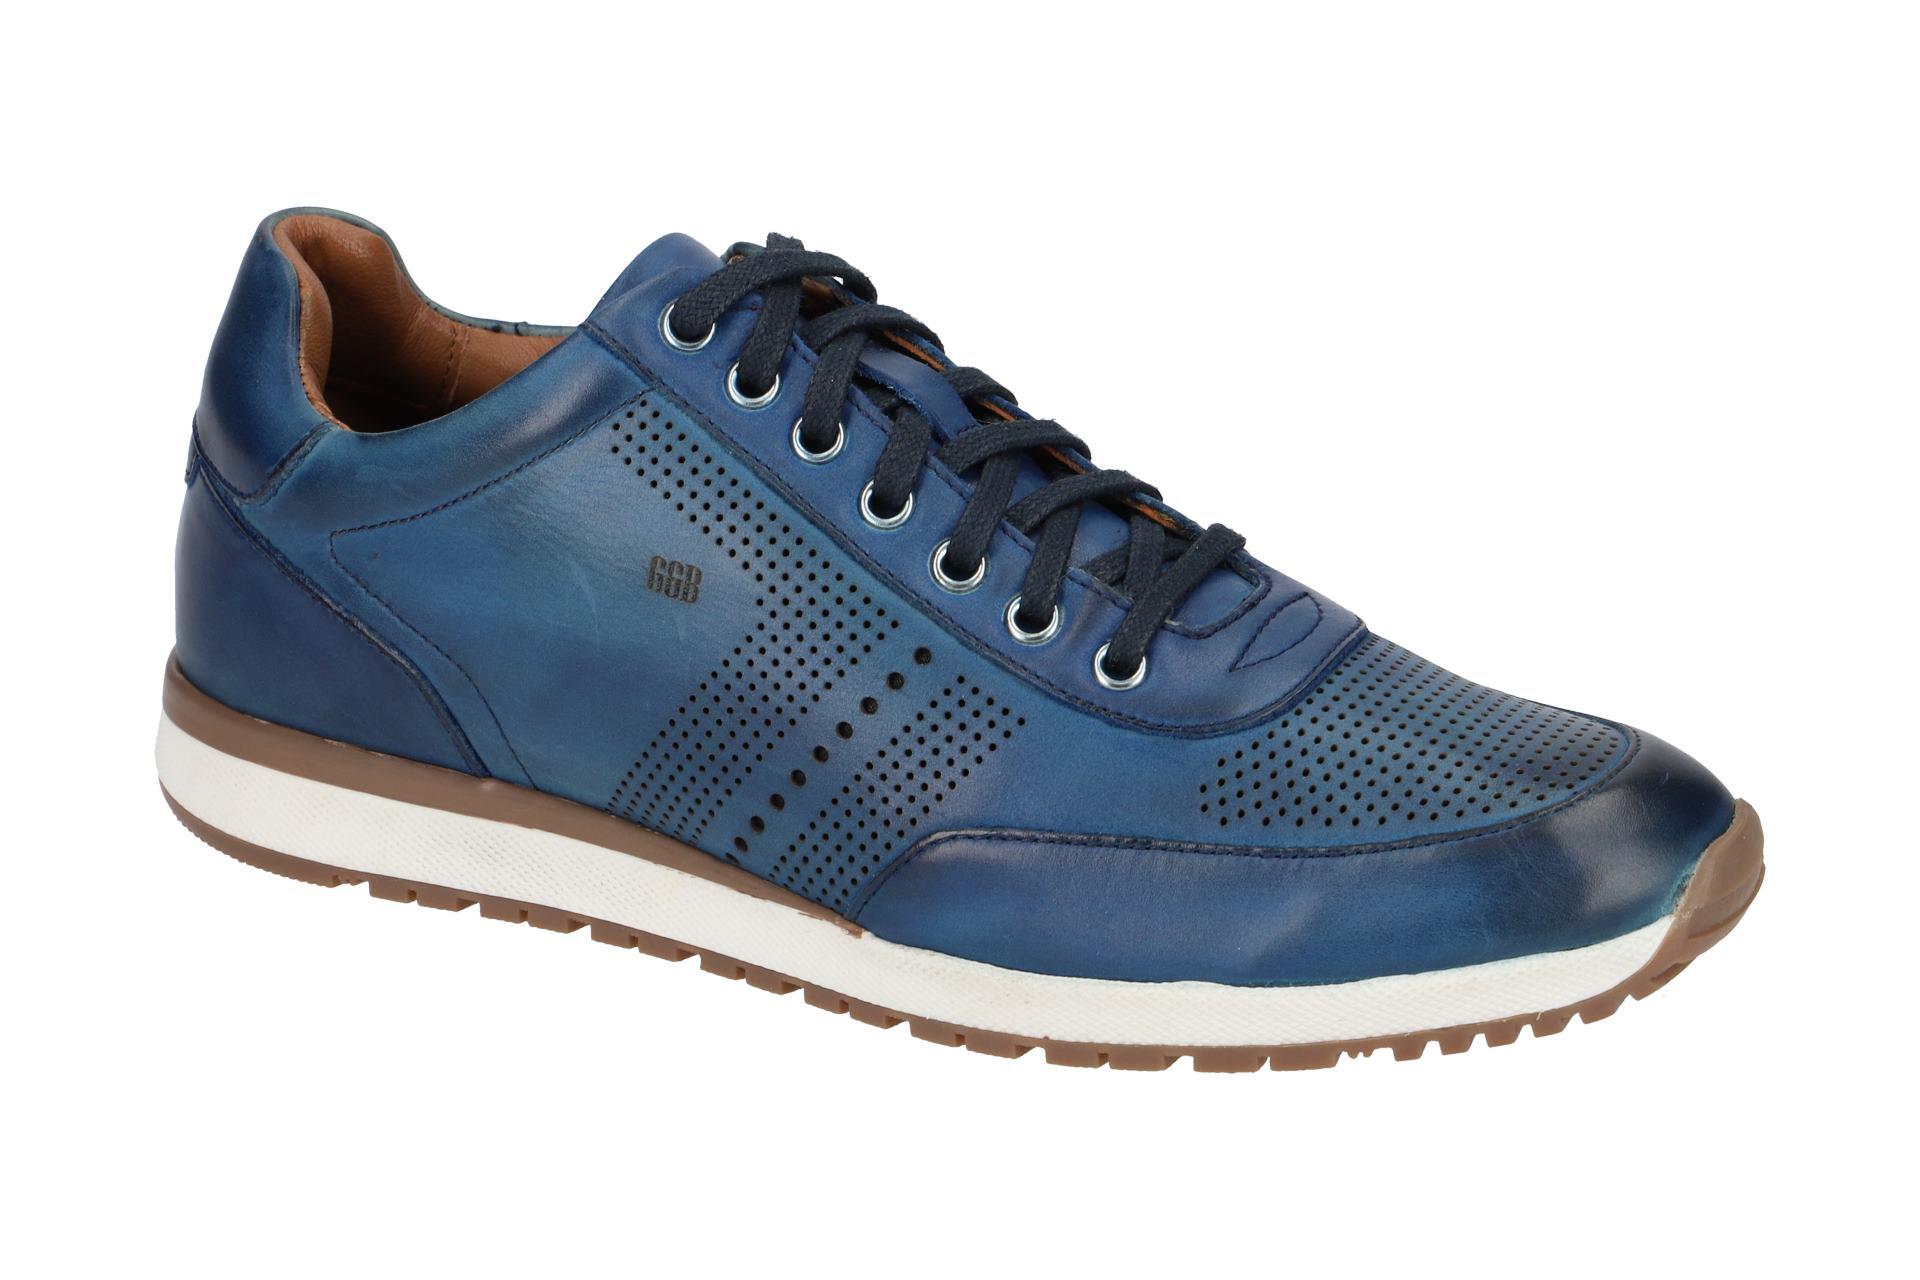 gordon bros schuhe sneaker blau new conte schuhhaus. Black Bedroom Furniture Sets. Home Design Ideas